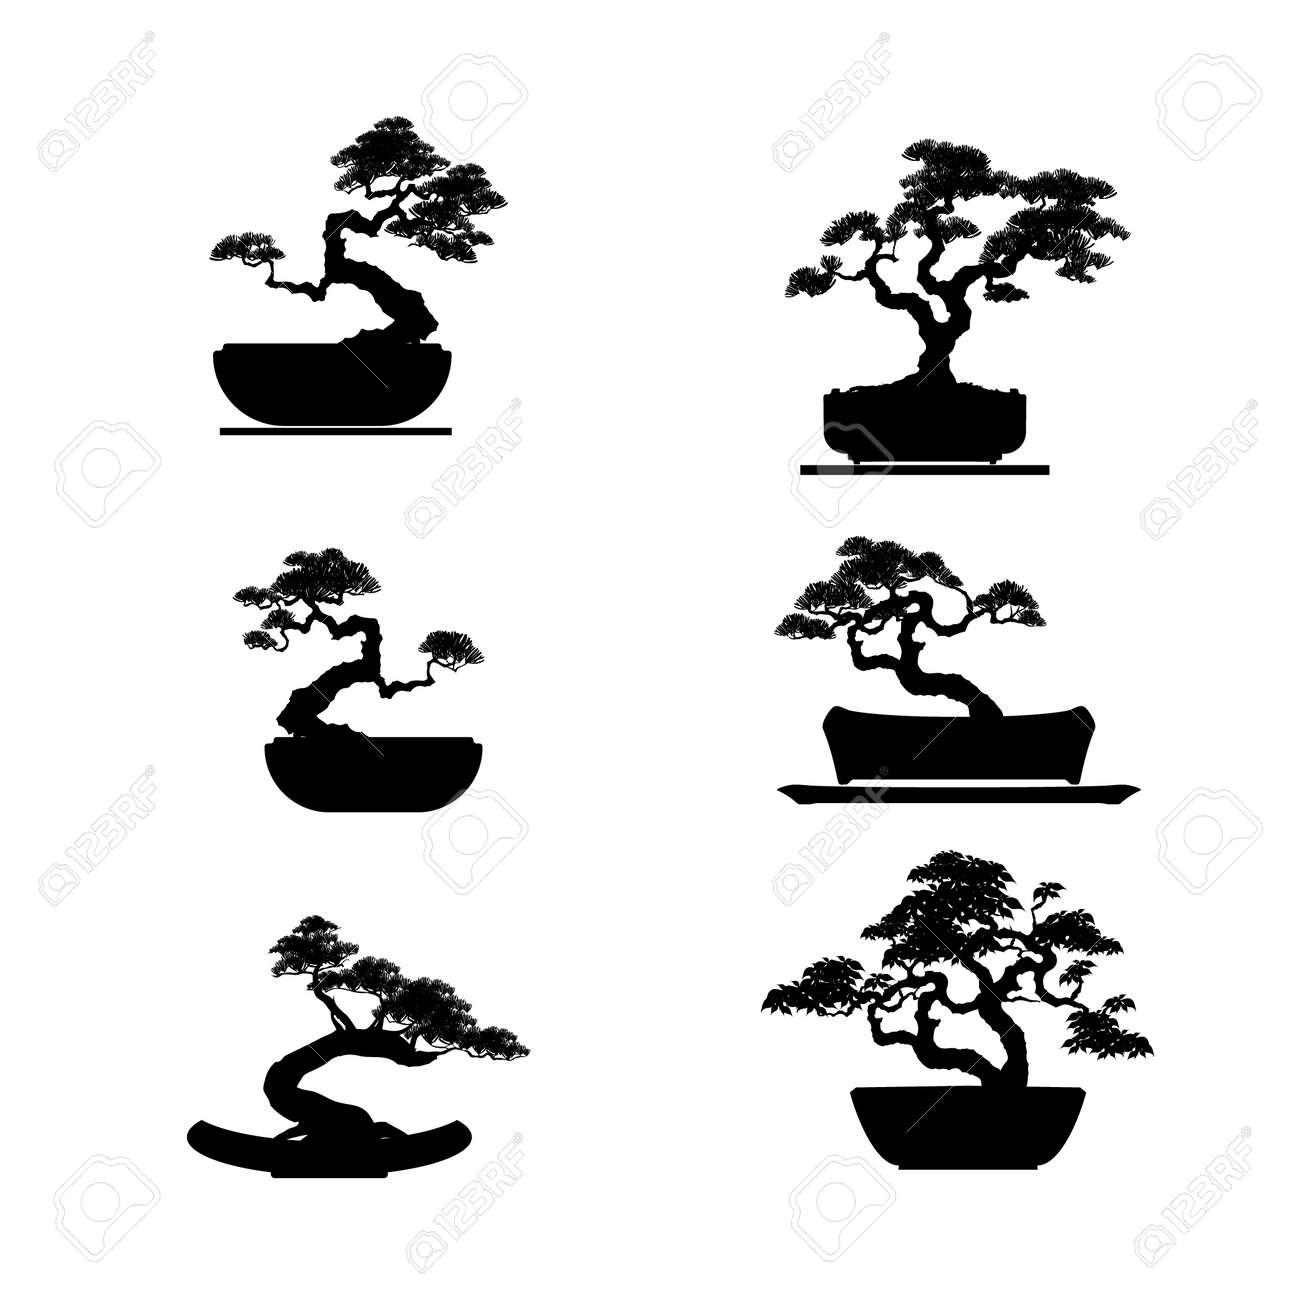 Bonsai Tree Silhouette Clip Art